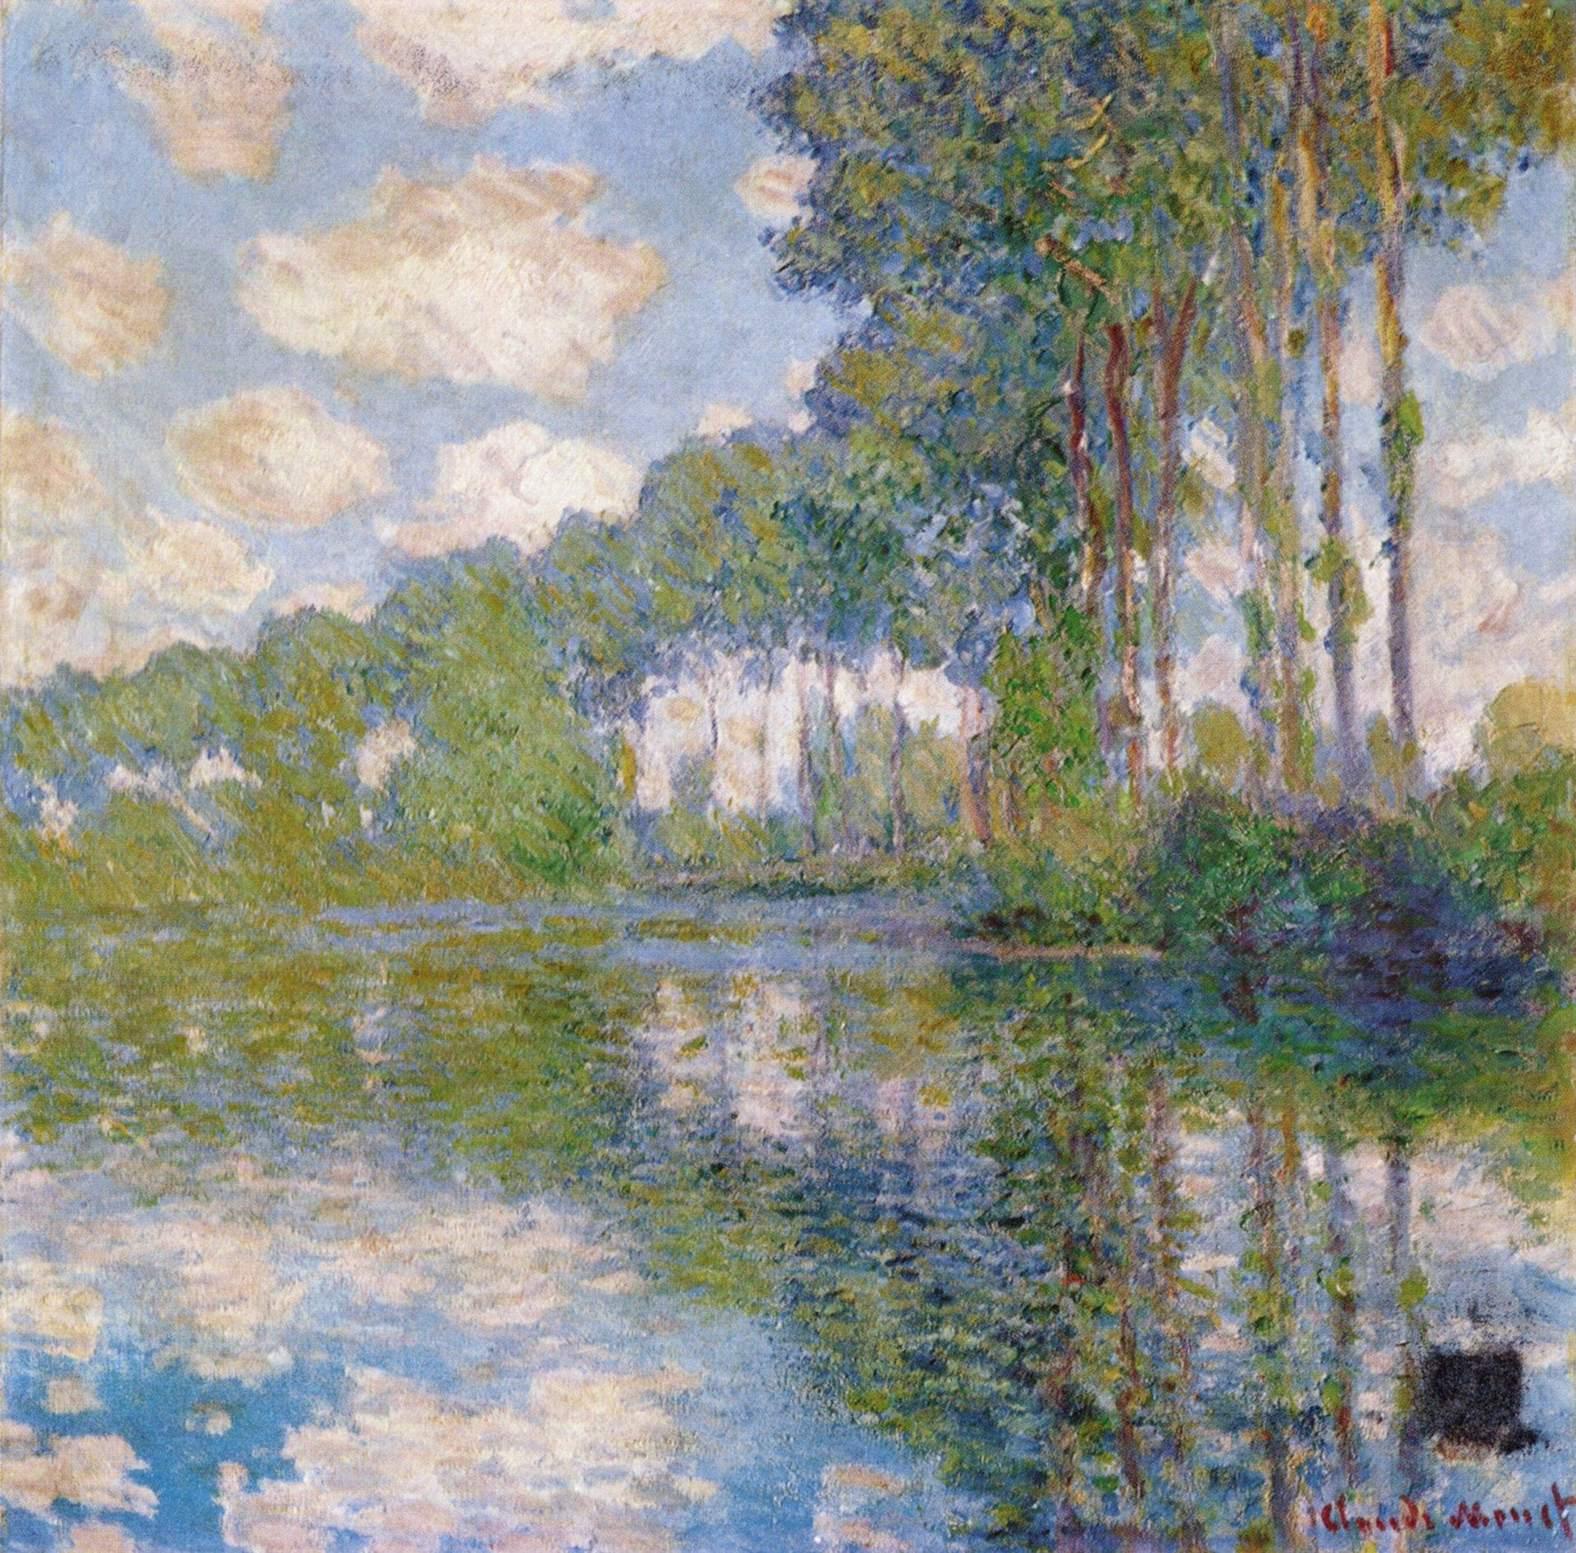 Monet: File:Claude Monet 040.jpg